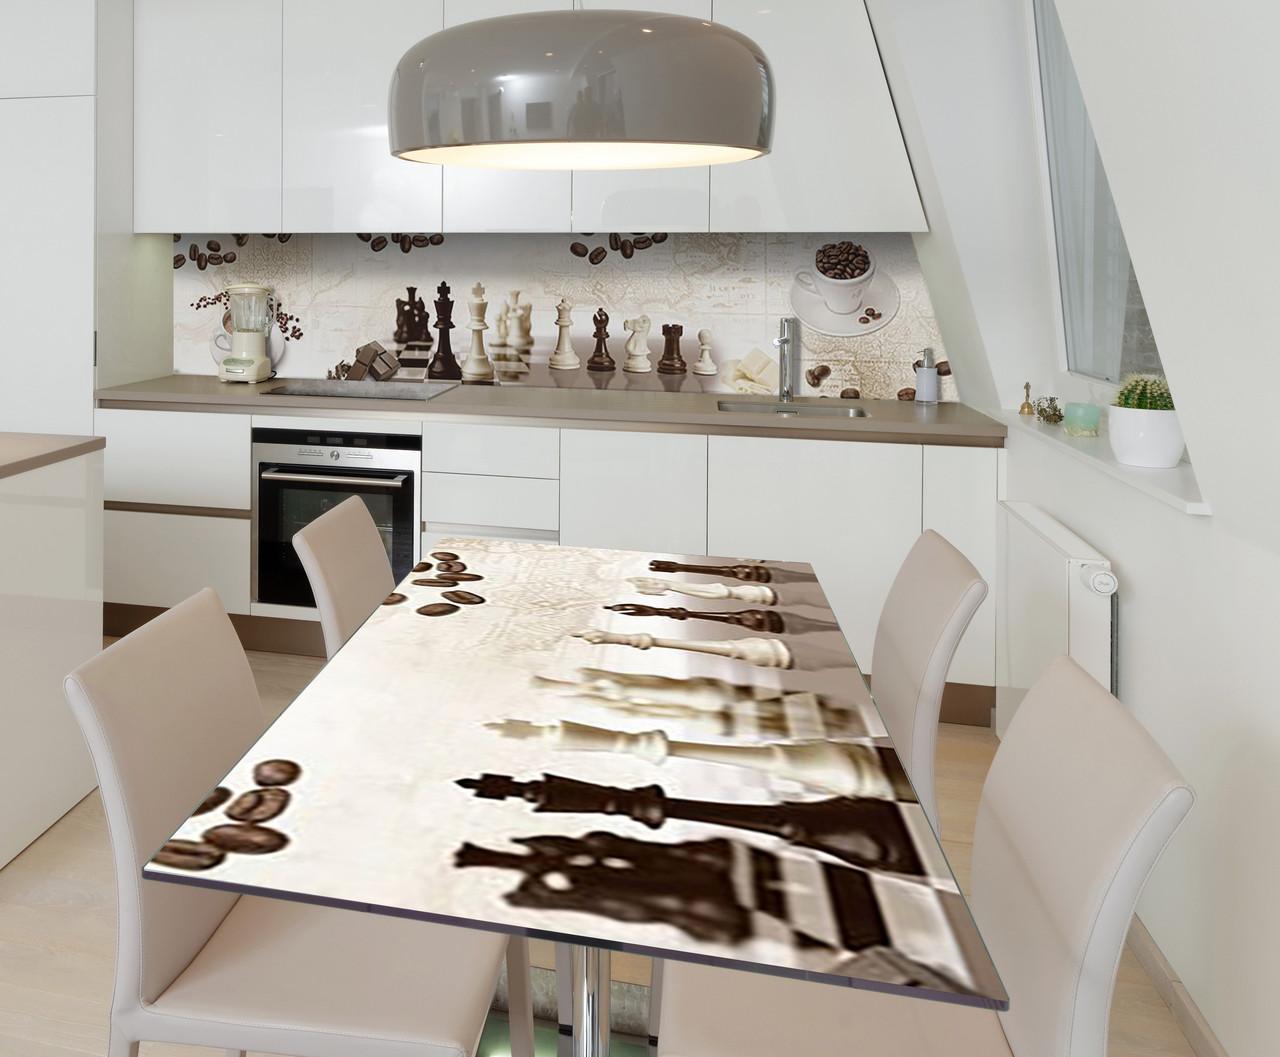 Наклейка 3Д виниловая на стол Zatarga «Утренняя партия» 600х1200 мм для домов, квартир, столов, кофейн, кафе